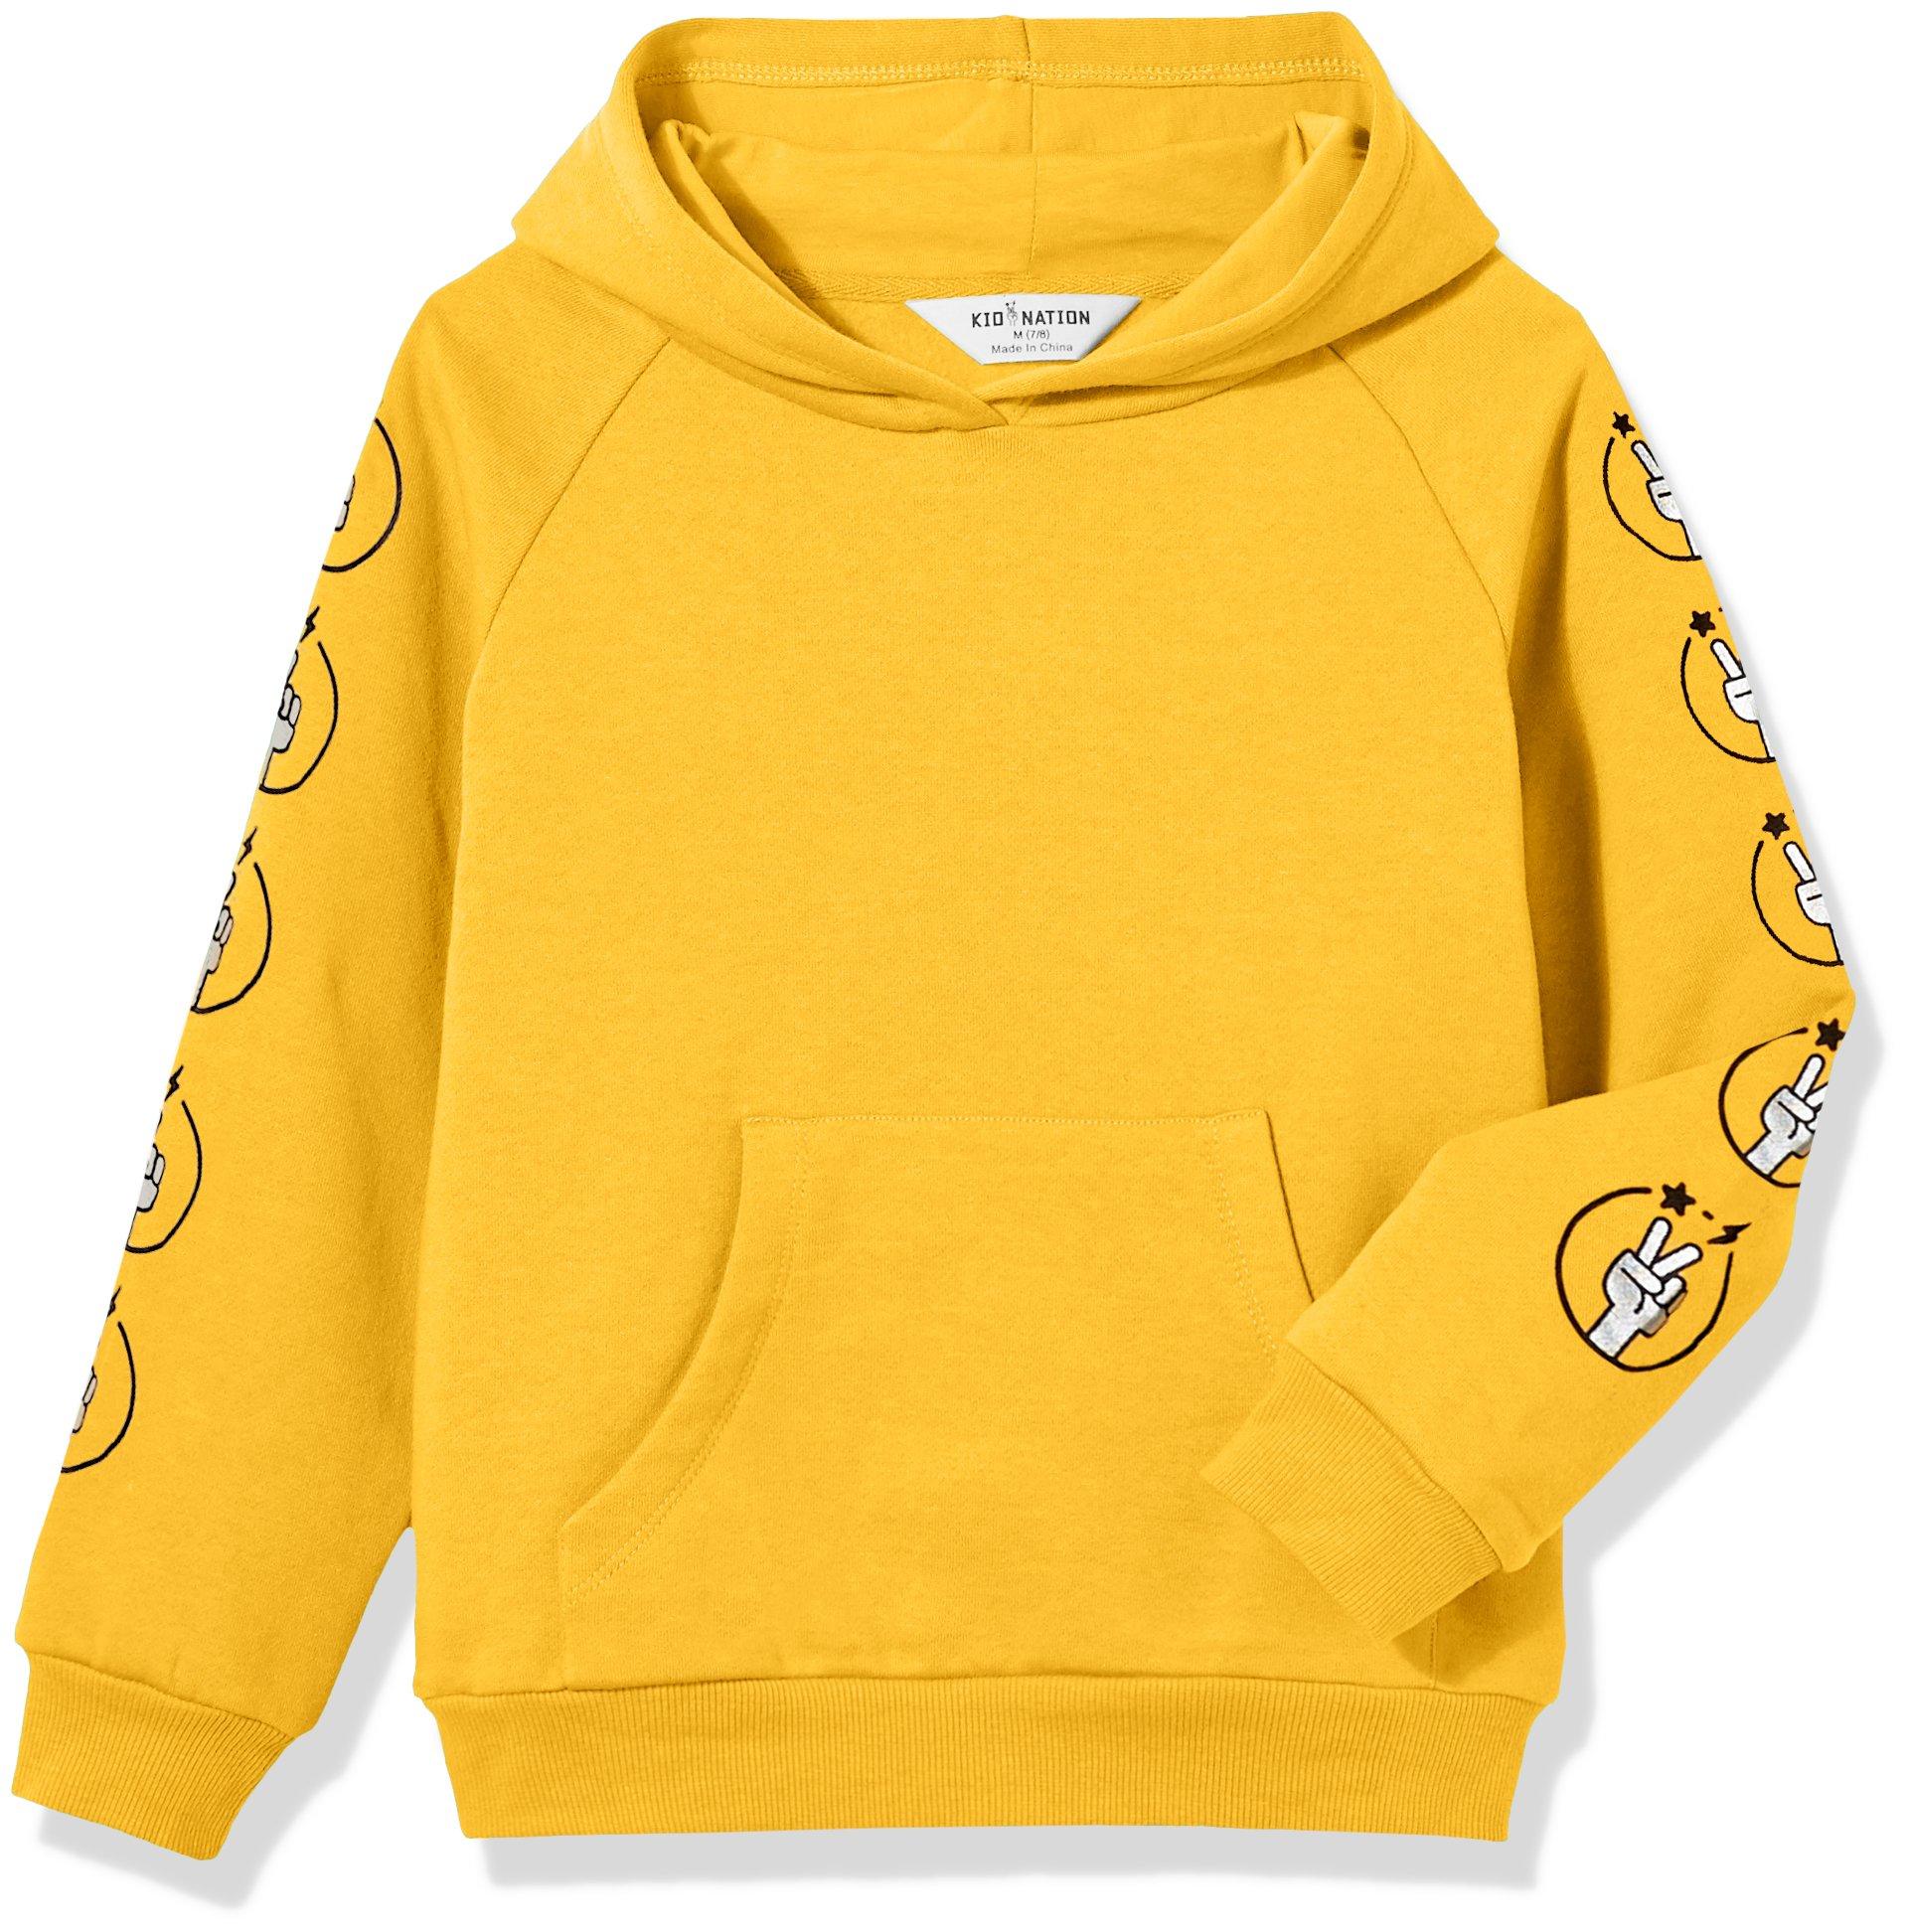 Kid Nation Kids' Solid Fleece Hooded Pullover Sweatshirt for Boys Girls XL Yellow